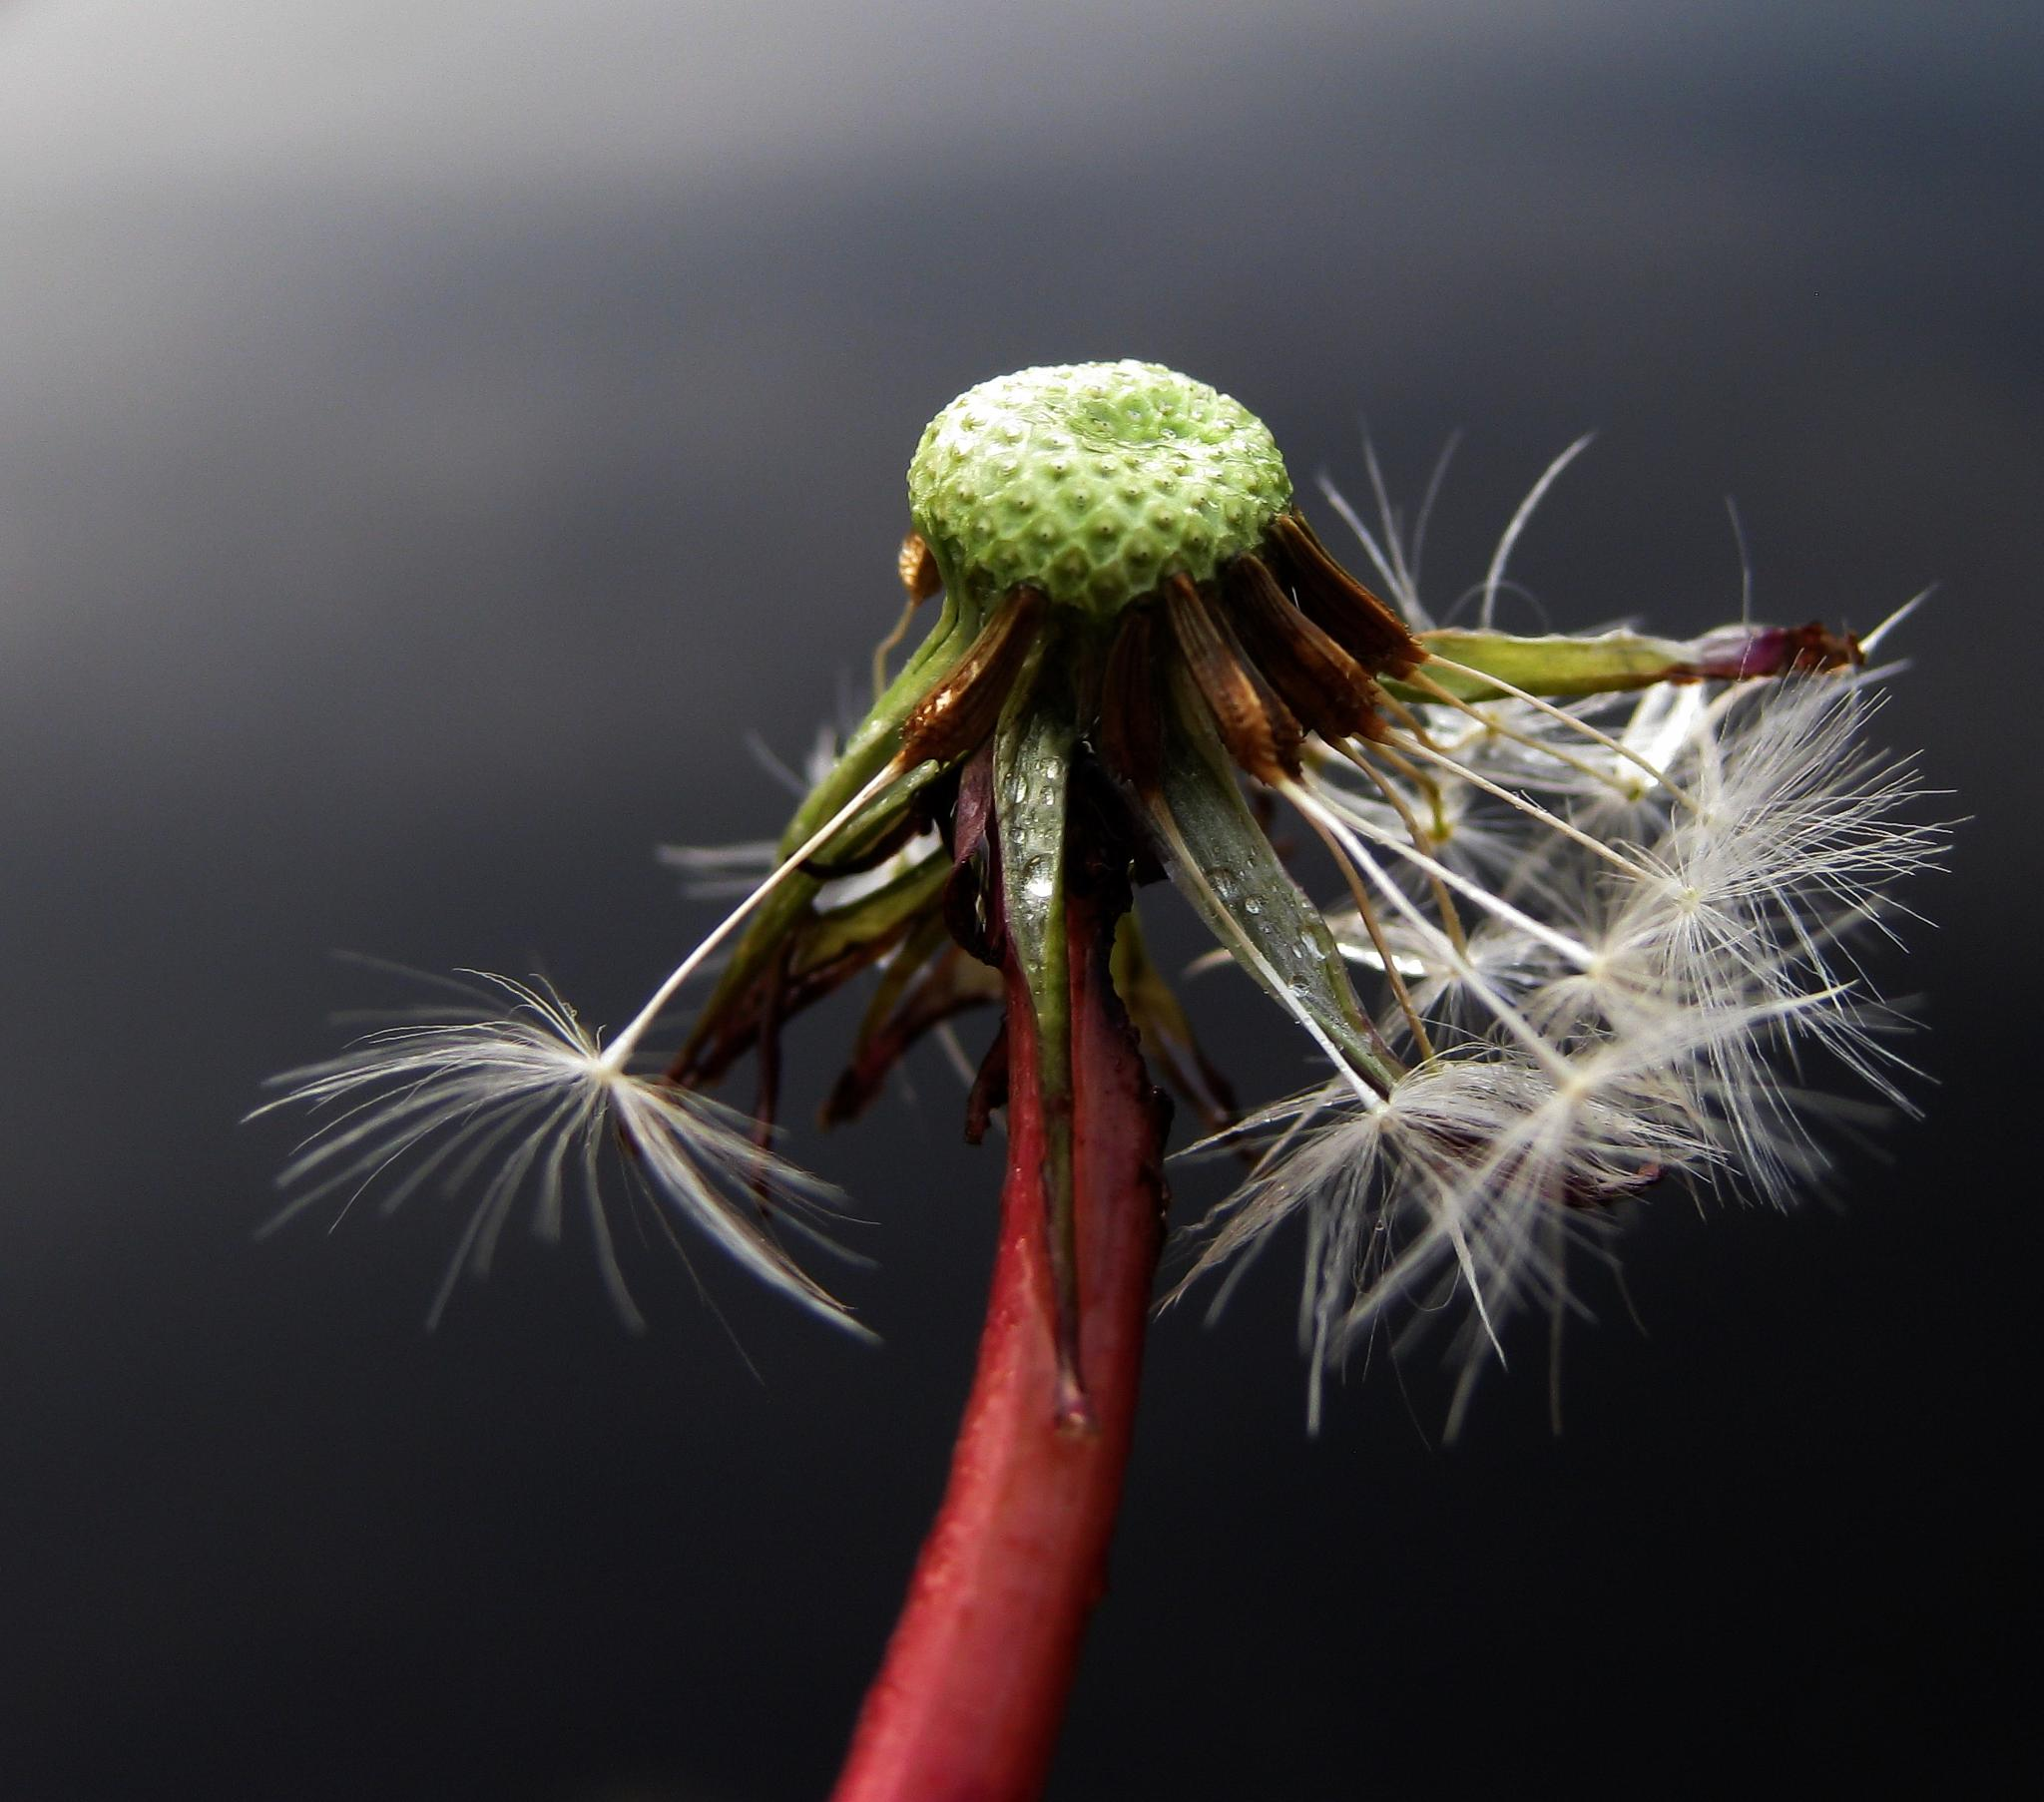 Dandelion by Ad Spruijt